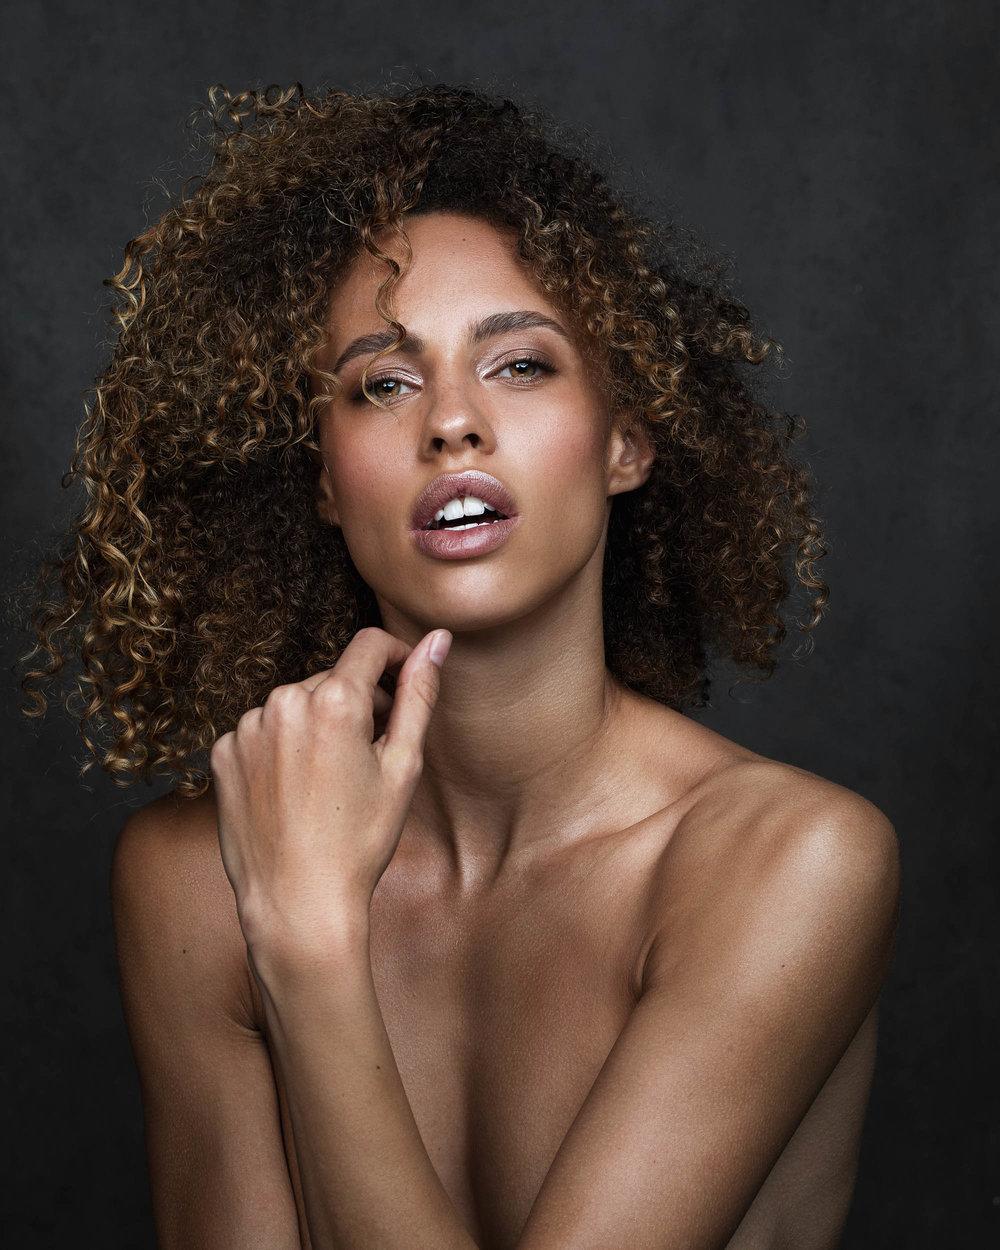 Headshot of model Grace Cotton taken by photographer Nick Walters at Lumi Studio.jpg